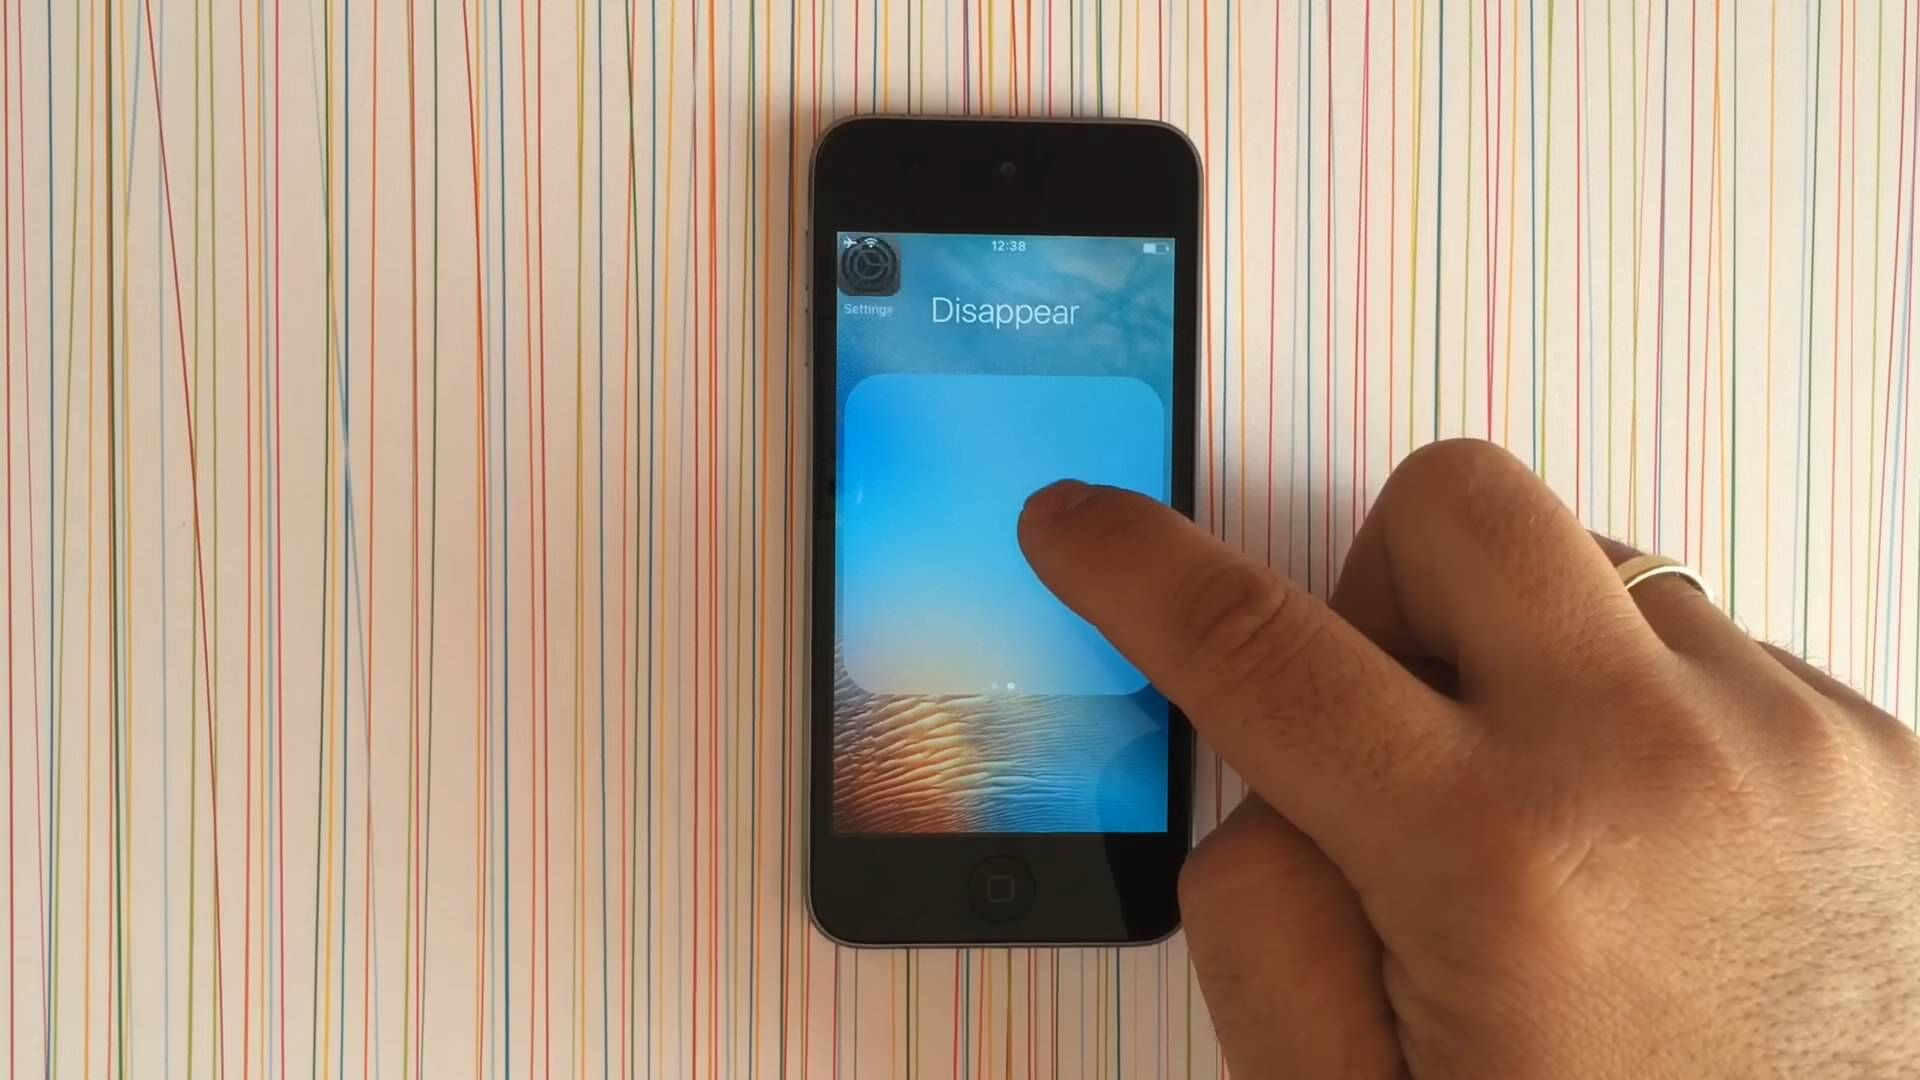 iOSの純正アプリを非表示にする方法